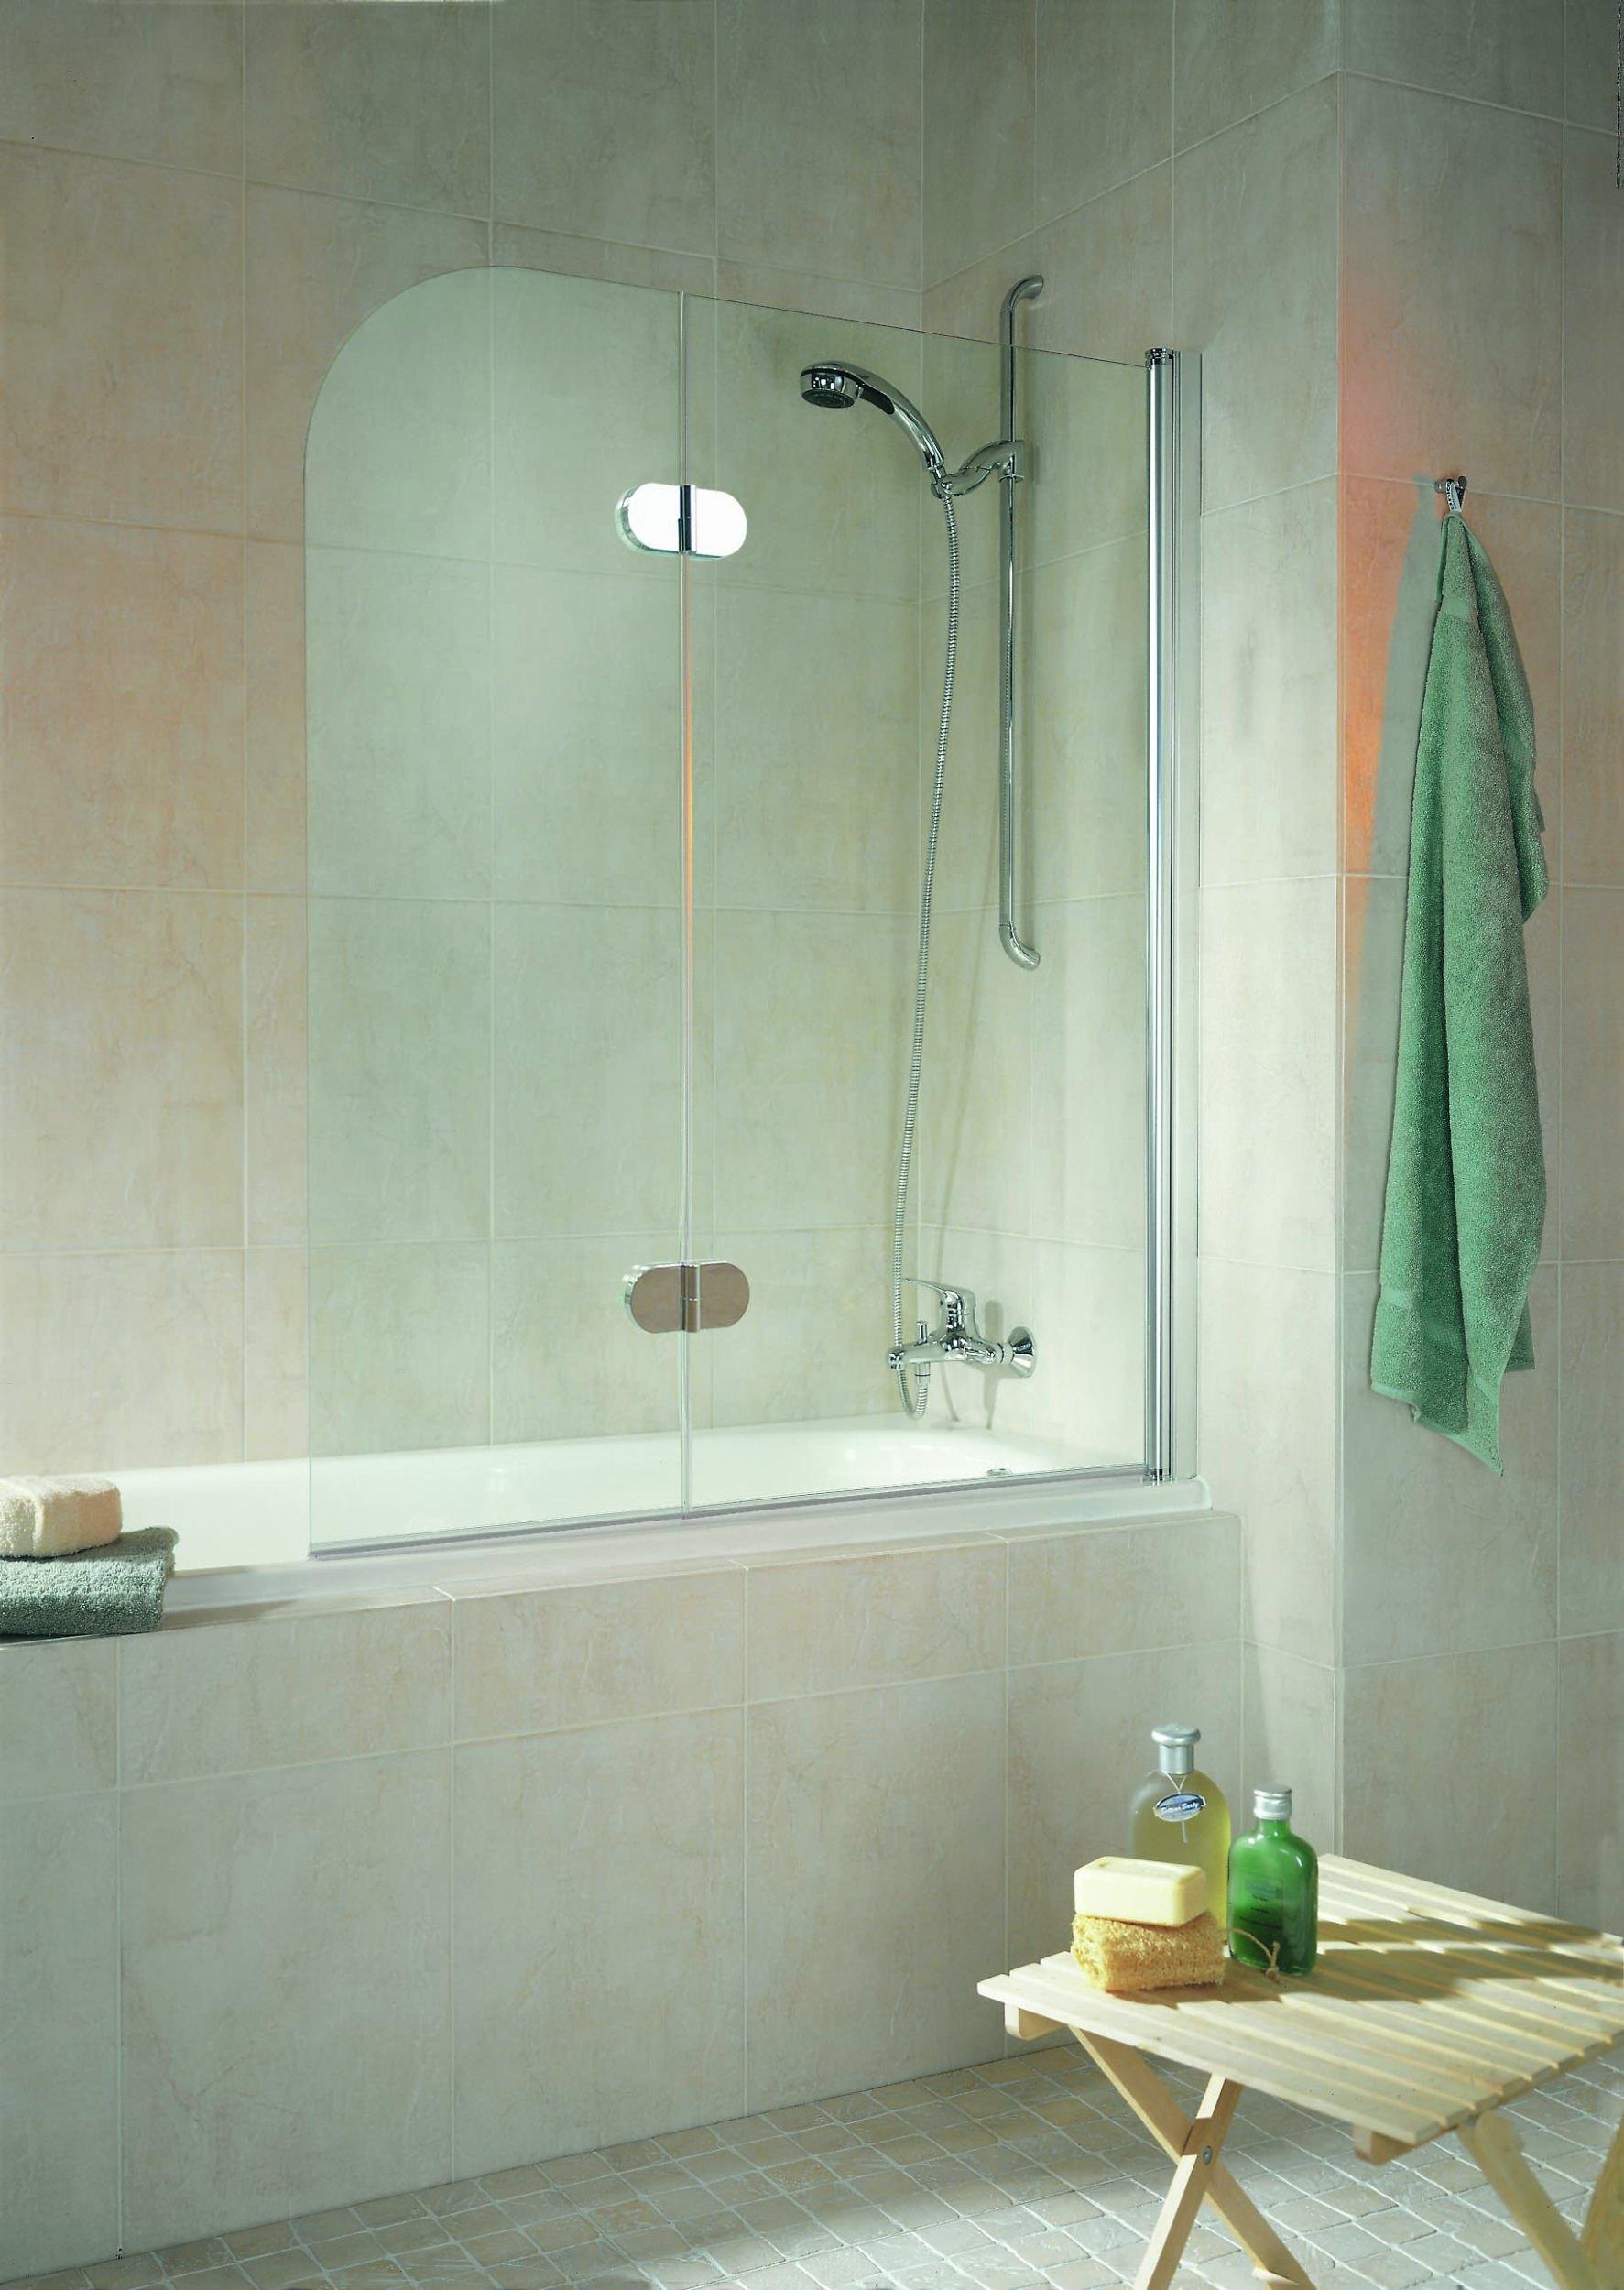 schulte komfort garant badewannenfaltwand 2 teilig grau. Black Bedroom Furniture Sets. Home Design Ideas